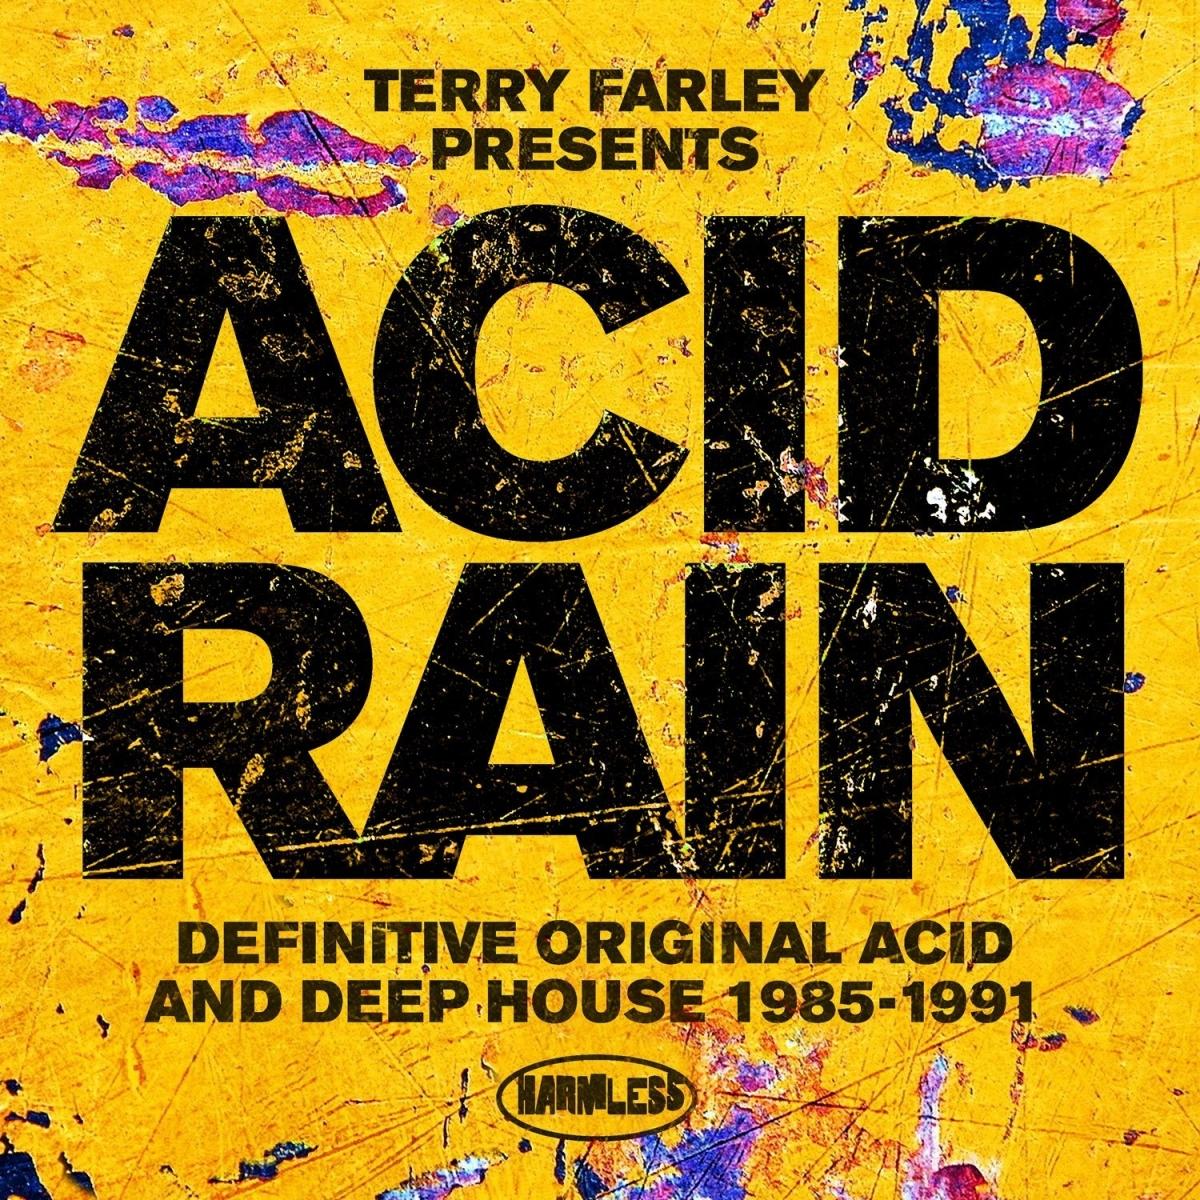 Album review terry farley presents acid rain for Best acid house albums